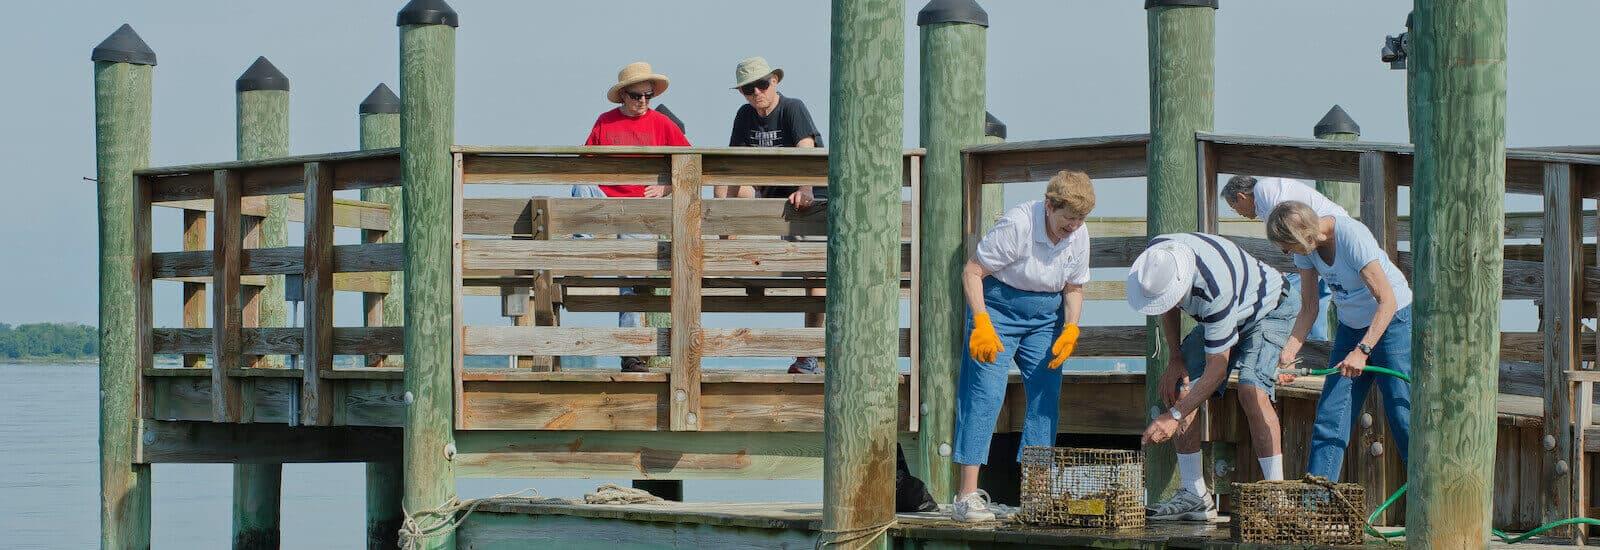 Environmental Stewardship at Asbury Solomons